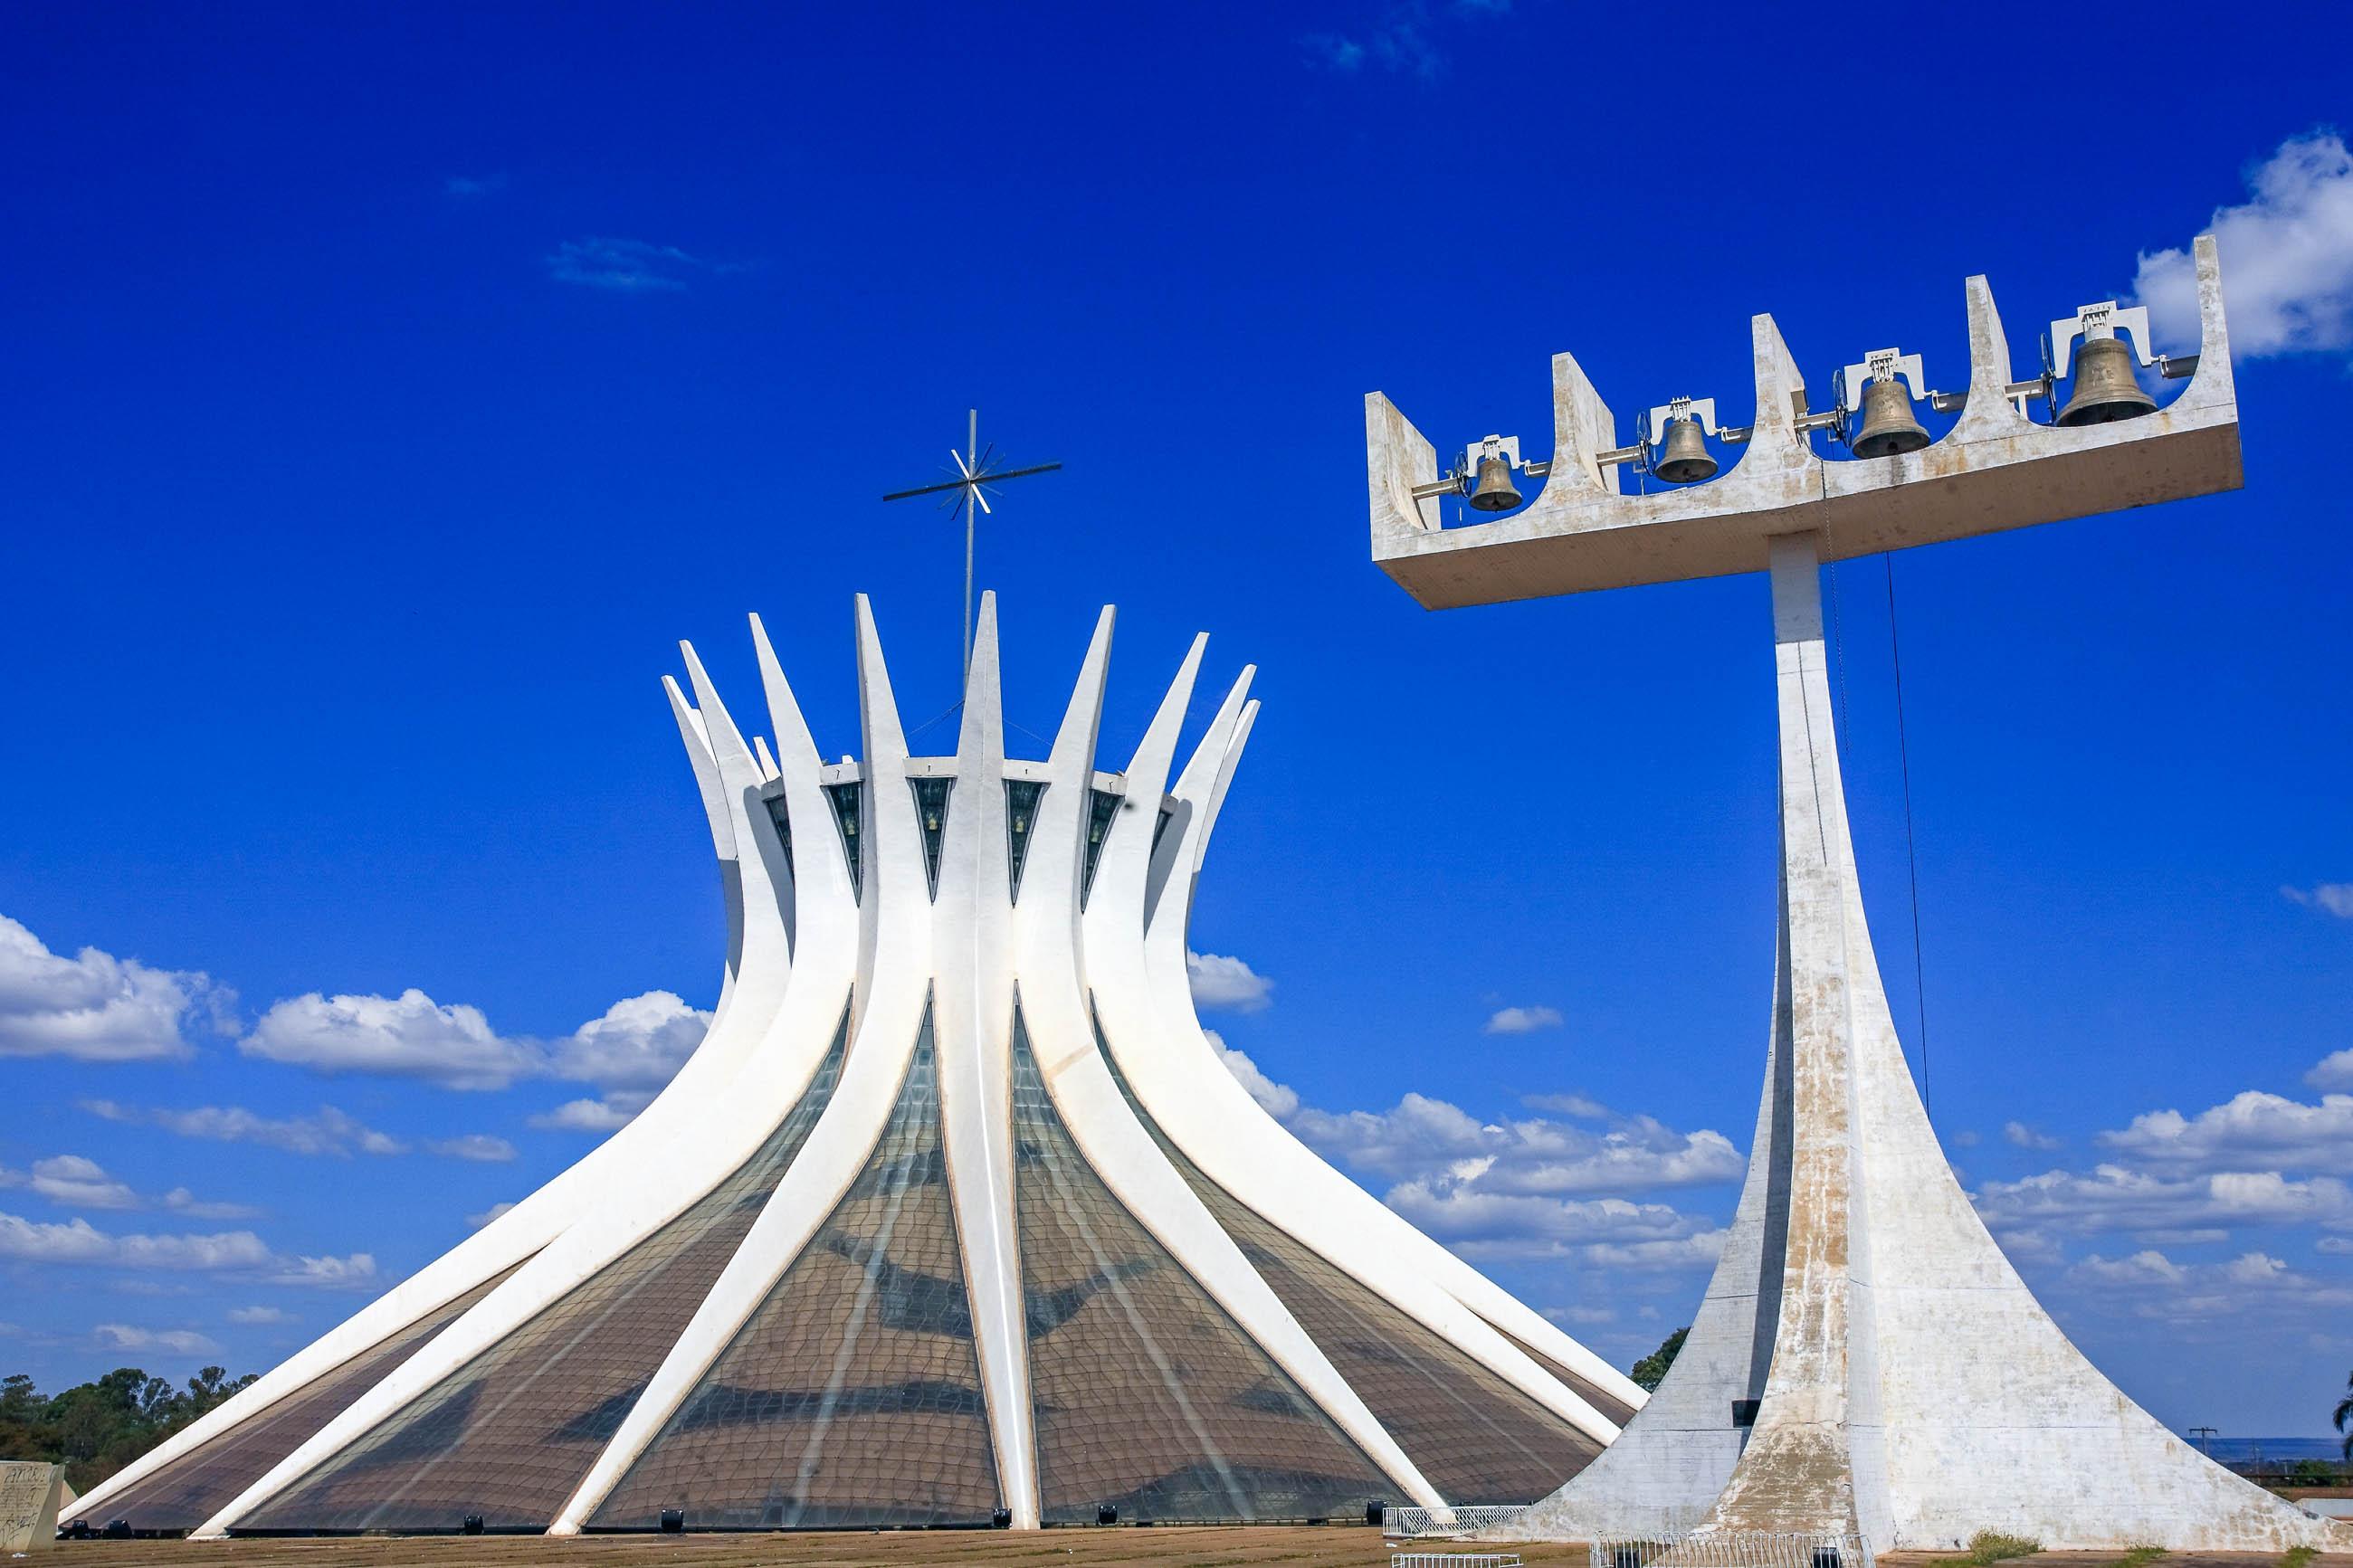 catedral metropolitana in brasilia brasilien franks travelbox. Black Bedroom Furniture Sets. Home Design Ideas